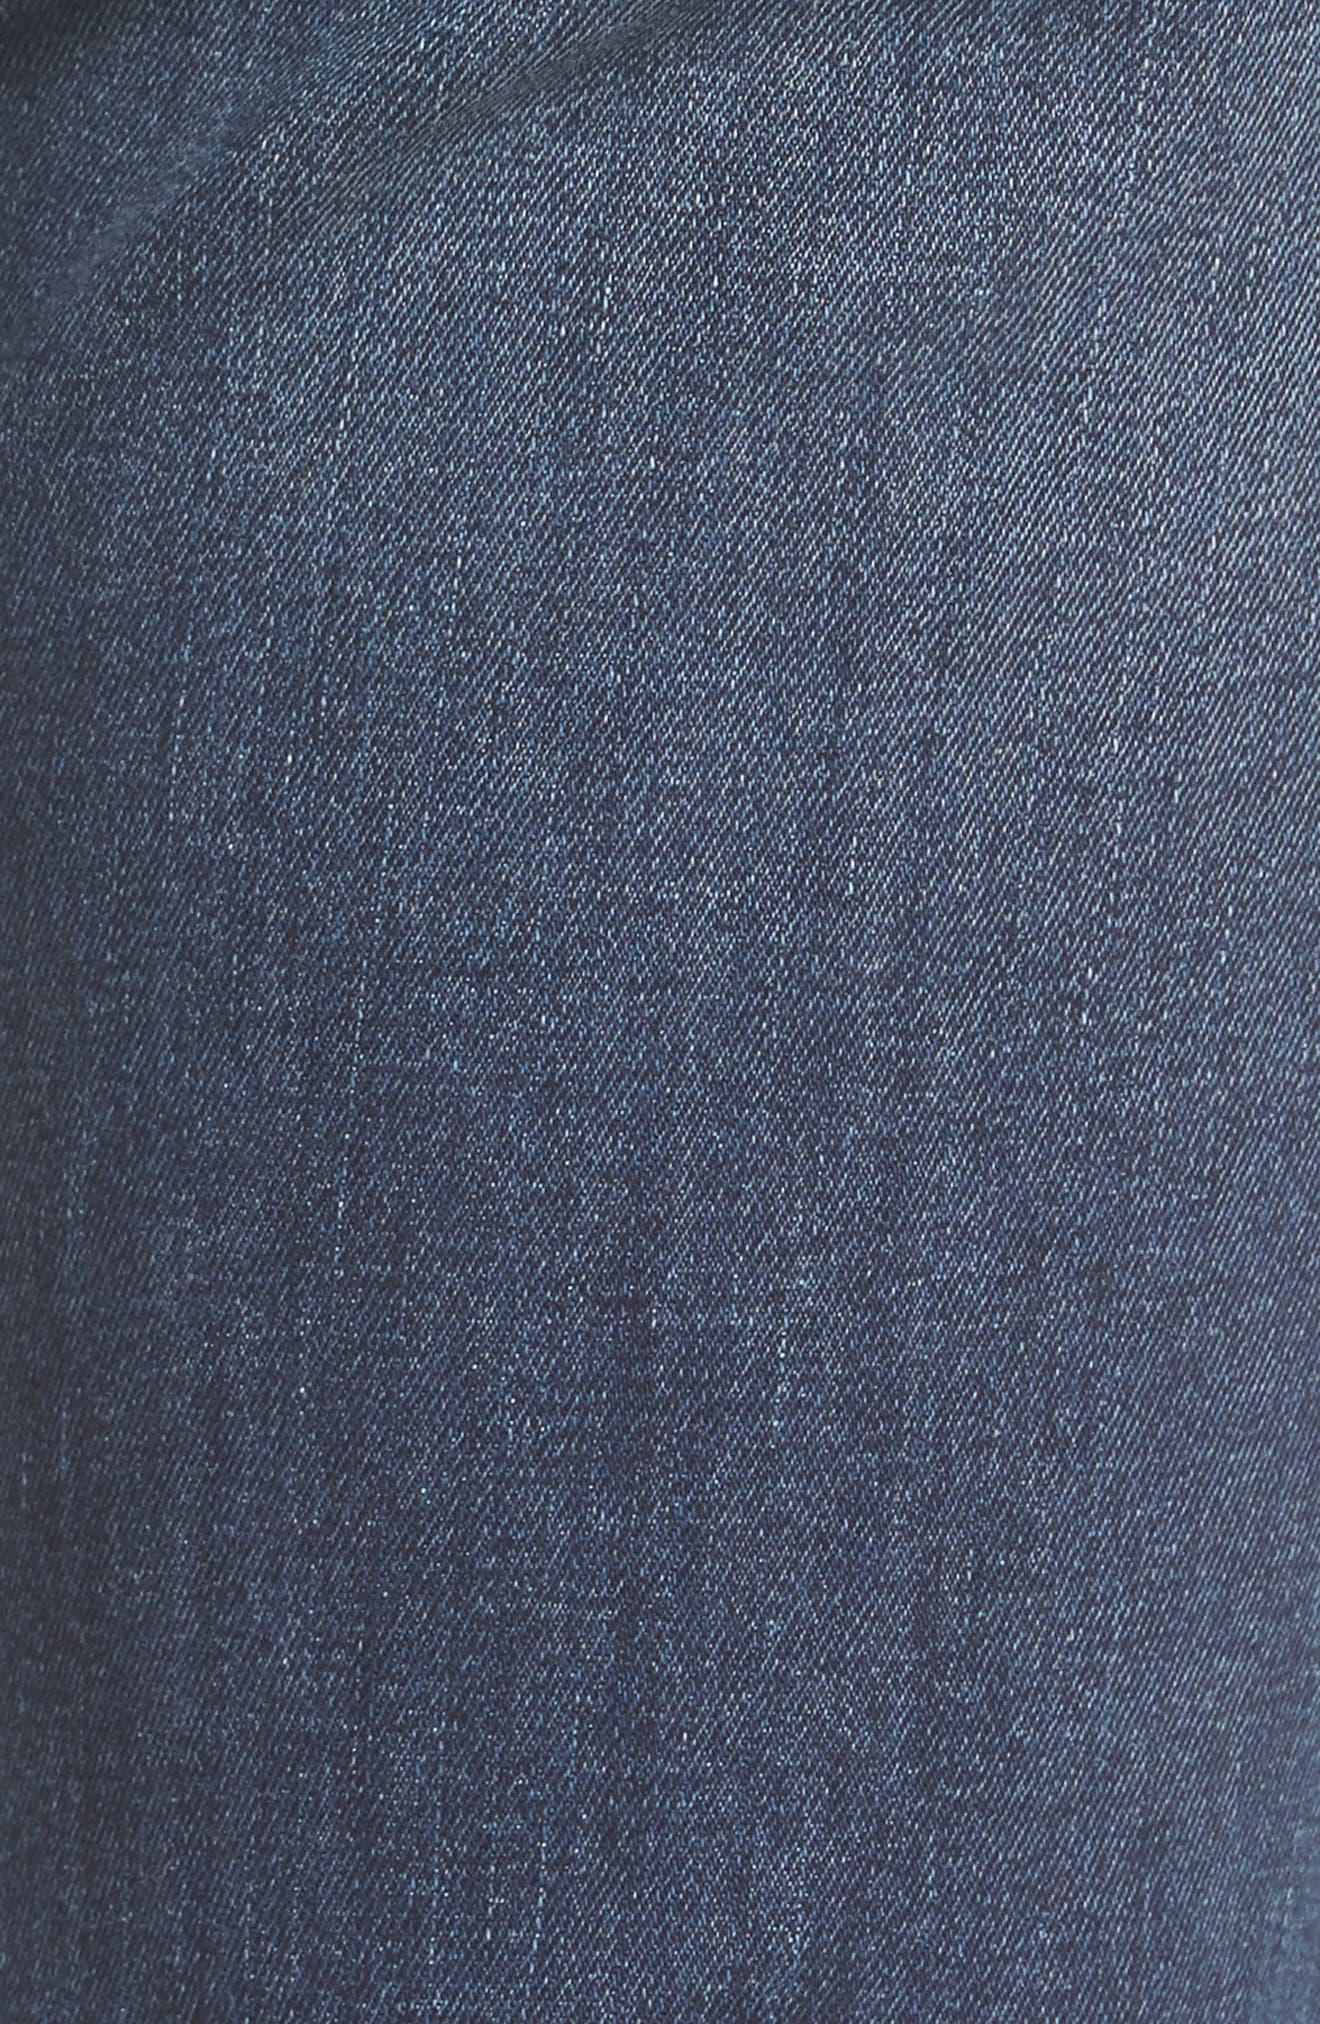 Riley Boyfriend Jeans,                             Alternate thumbnail 5, color,                             Hayden